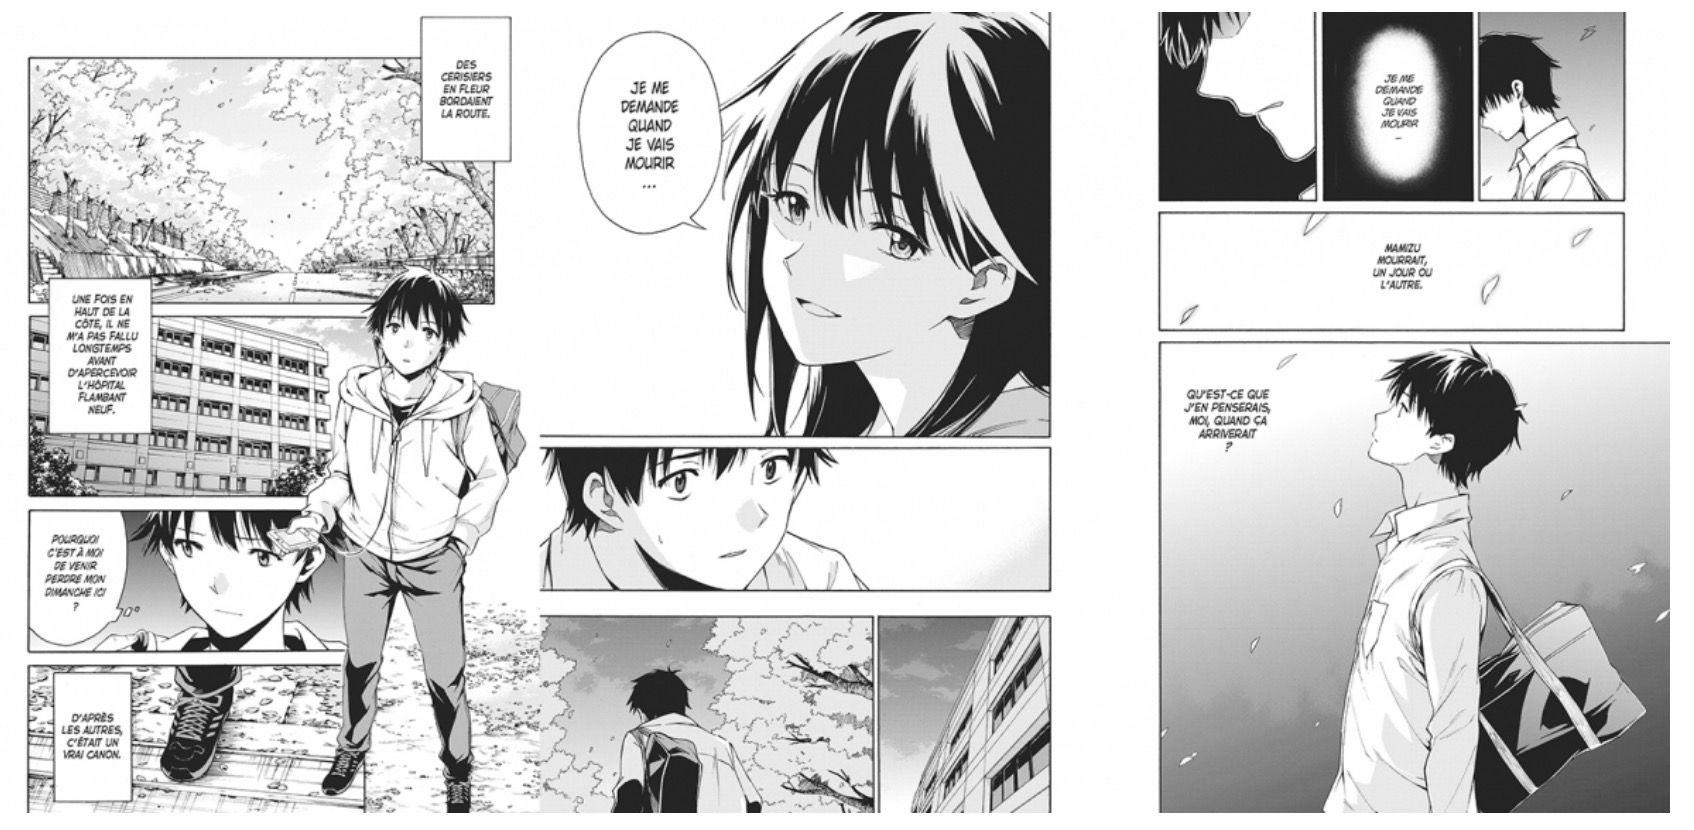 rdv-crepuscule-manga-extrait-annonce.jpg